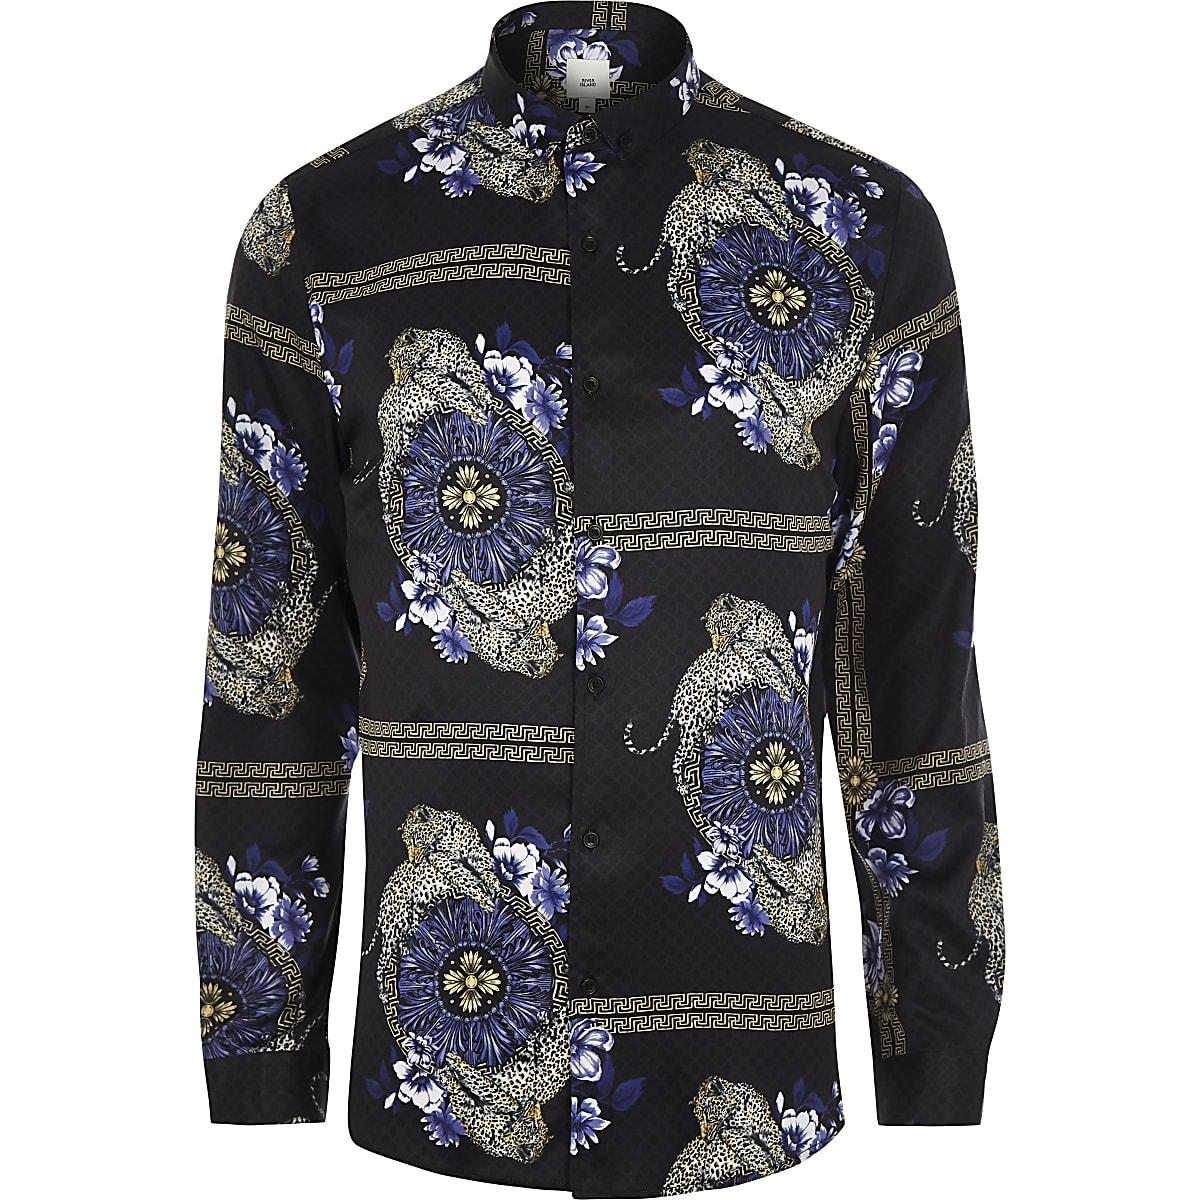 Black baroque leopard print long sleeve shirt